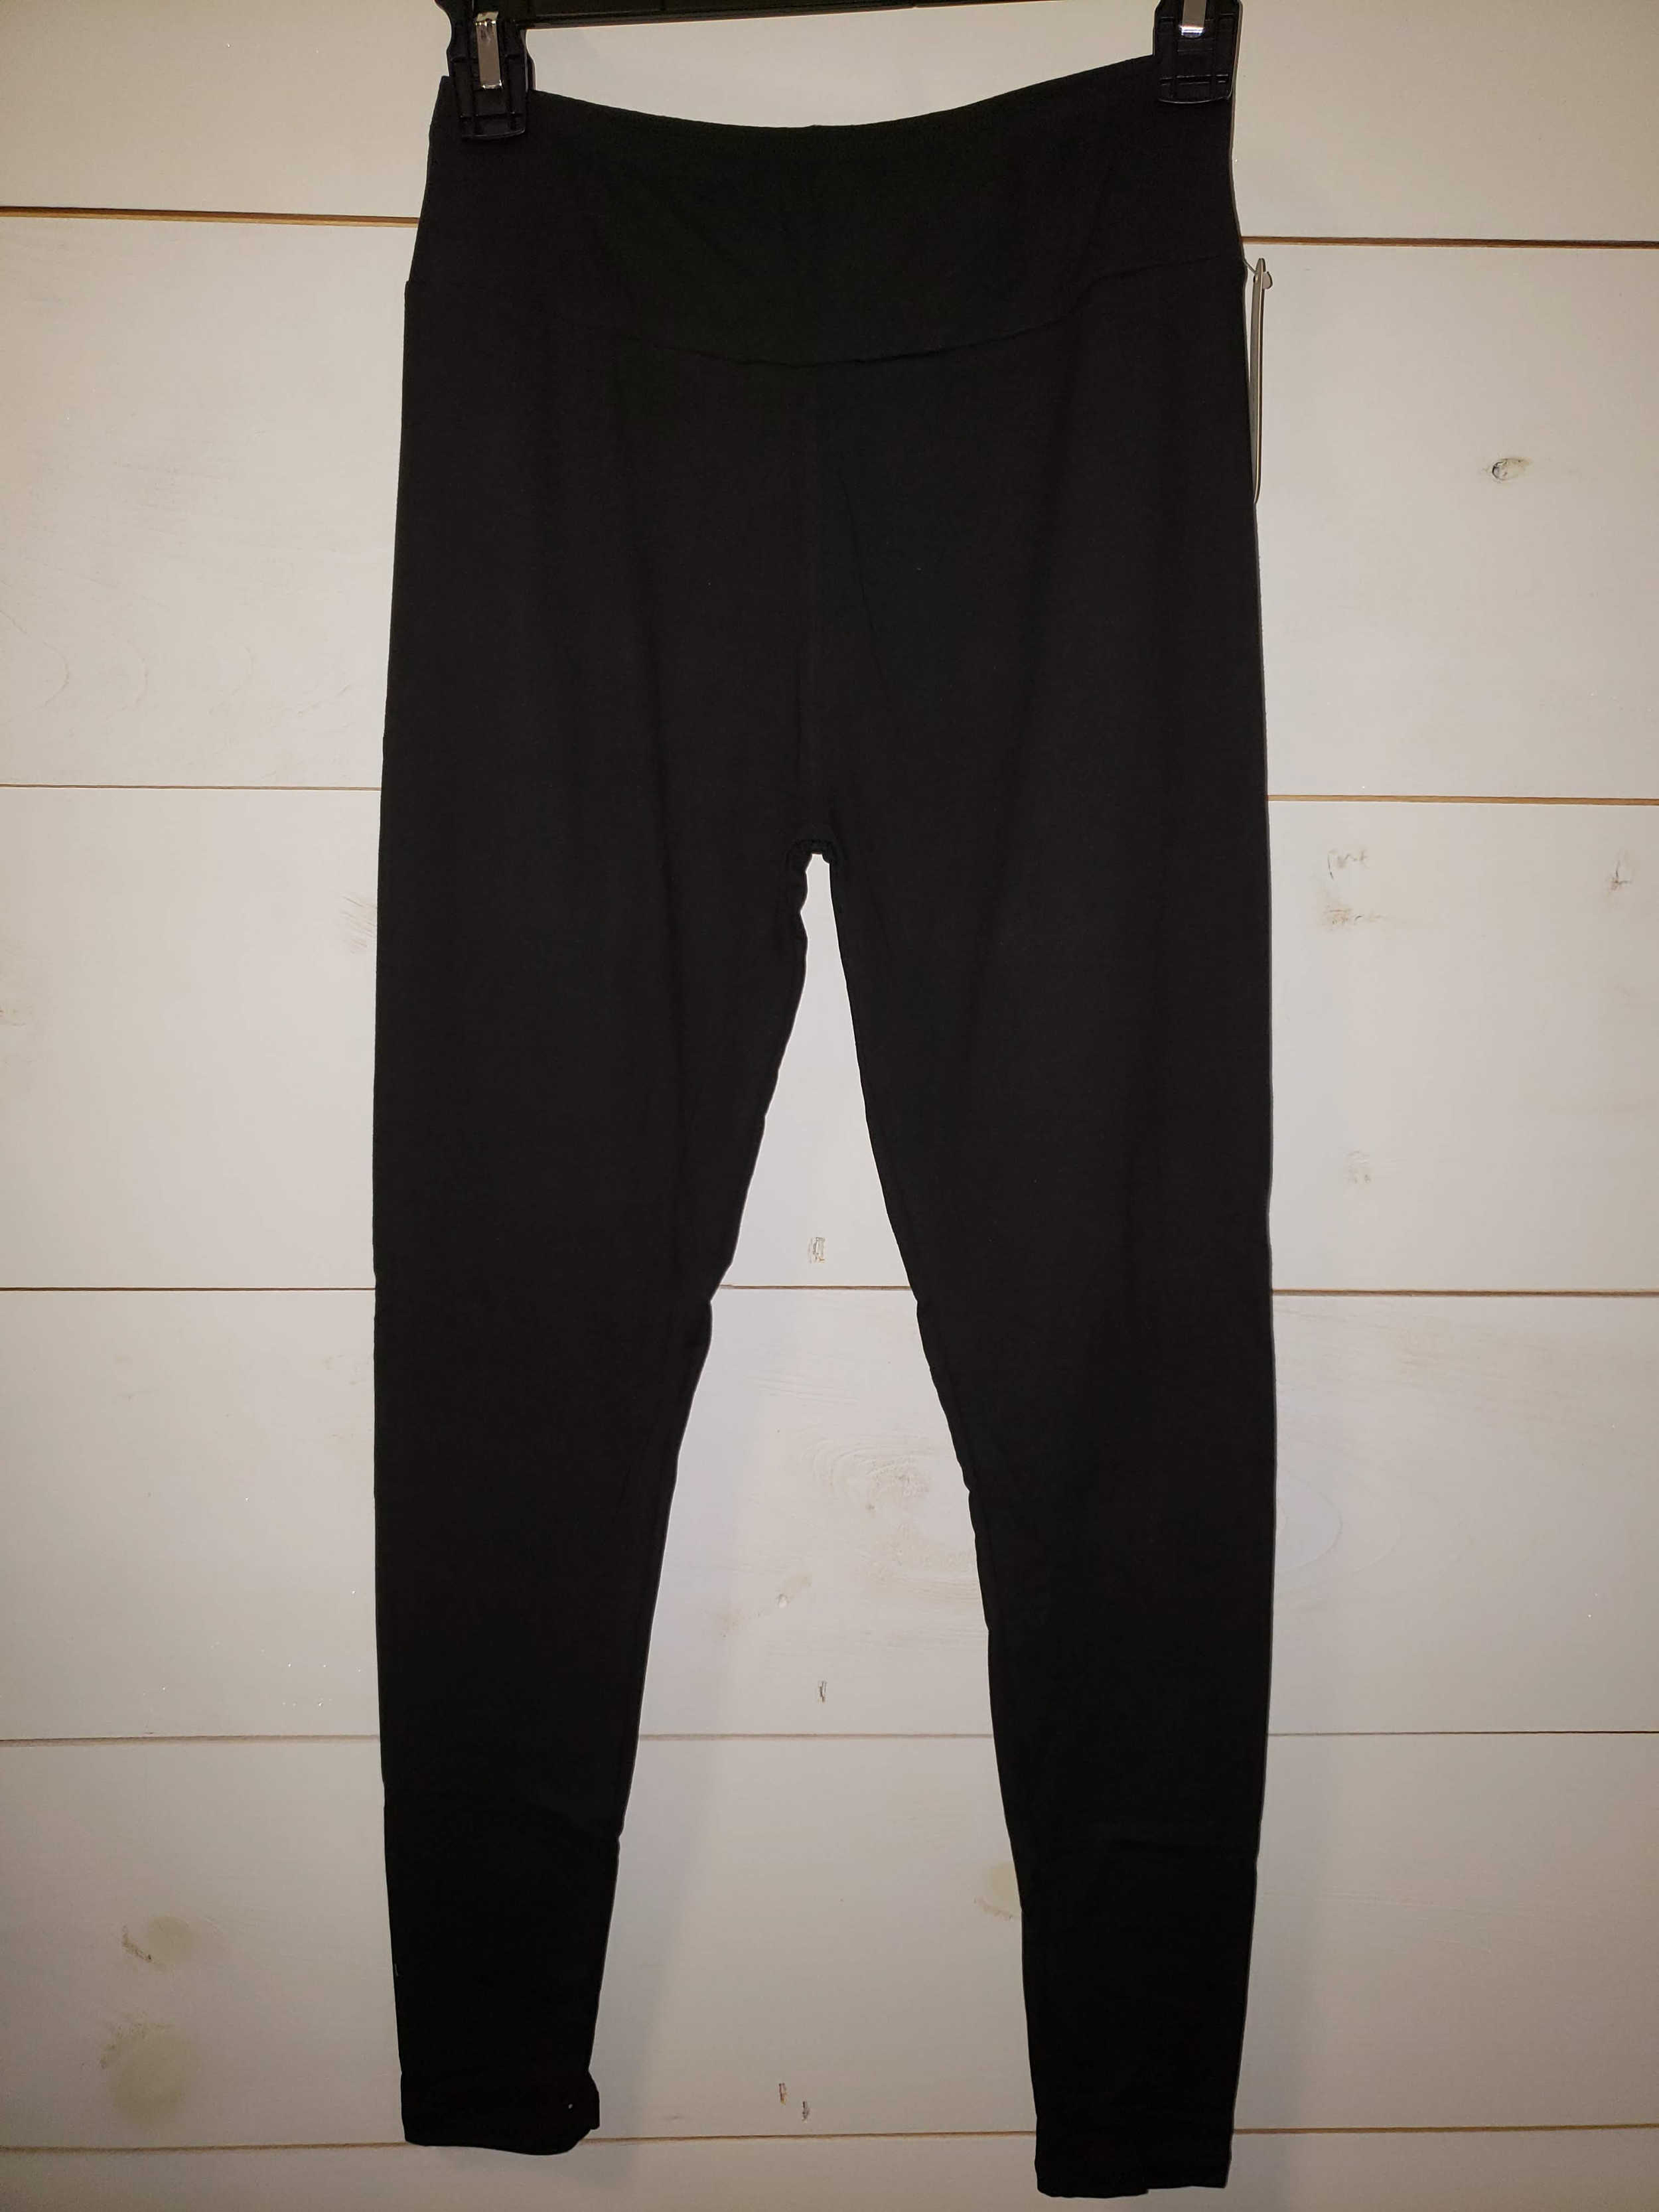 Solid Black Yoga Band Leggings